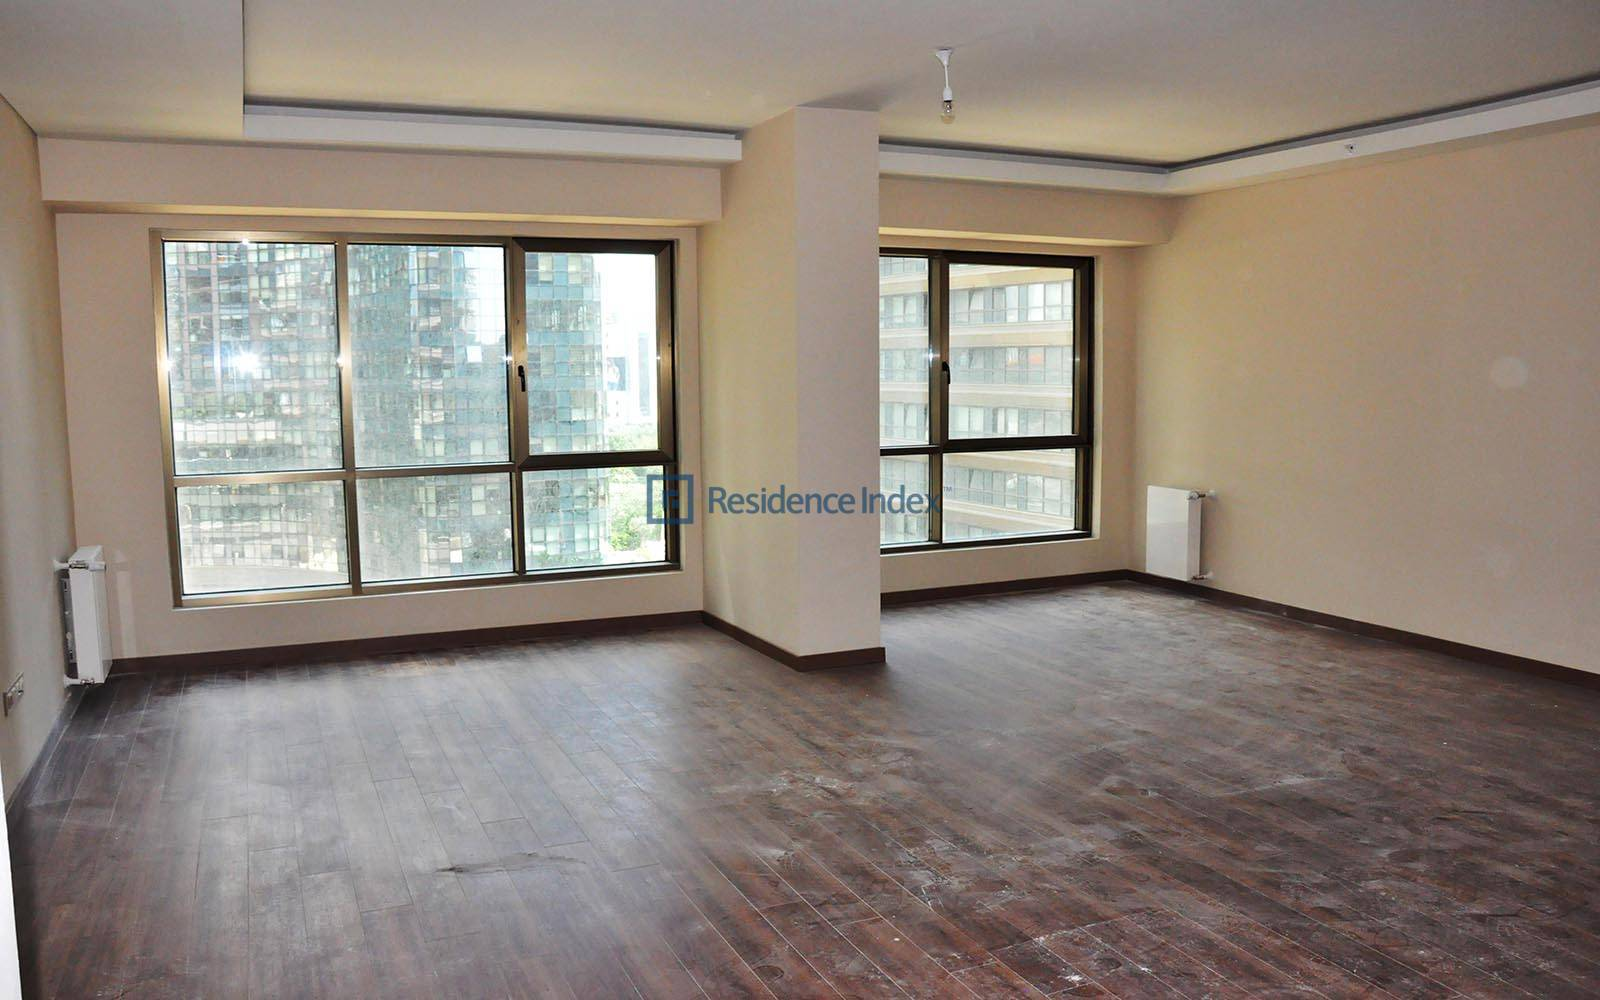 NEF 22 - Great Location Nef 22 Ataköy  4 + 1 Apartment for Sale